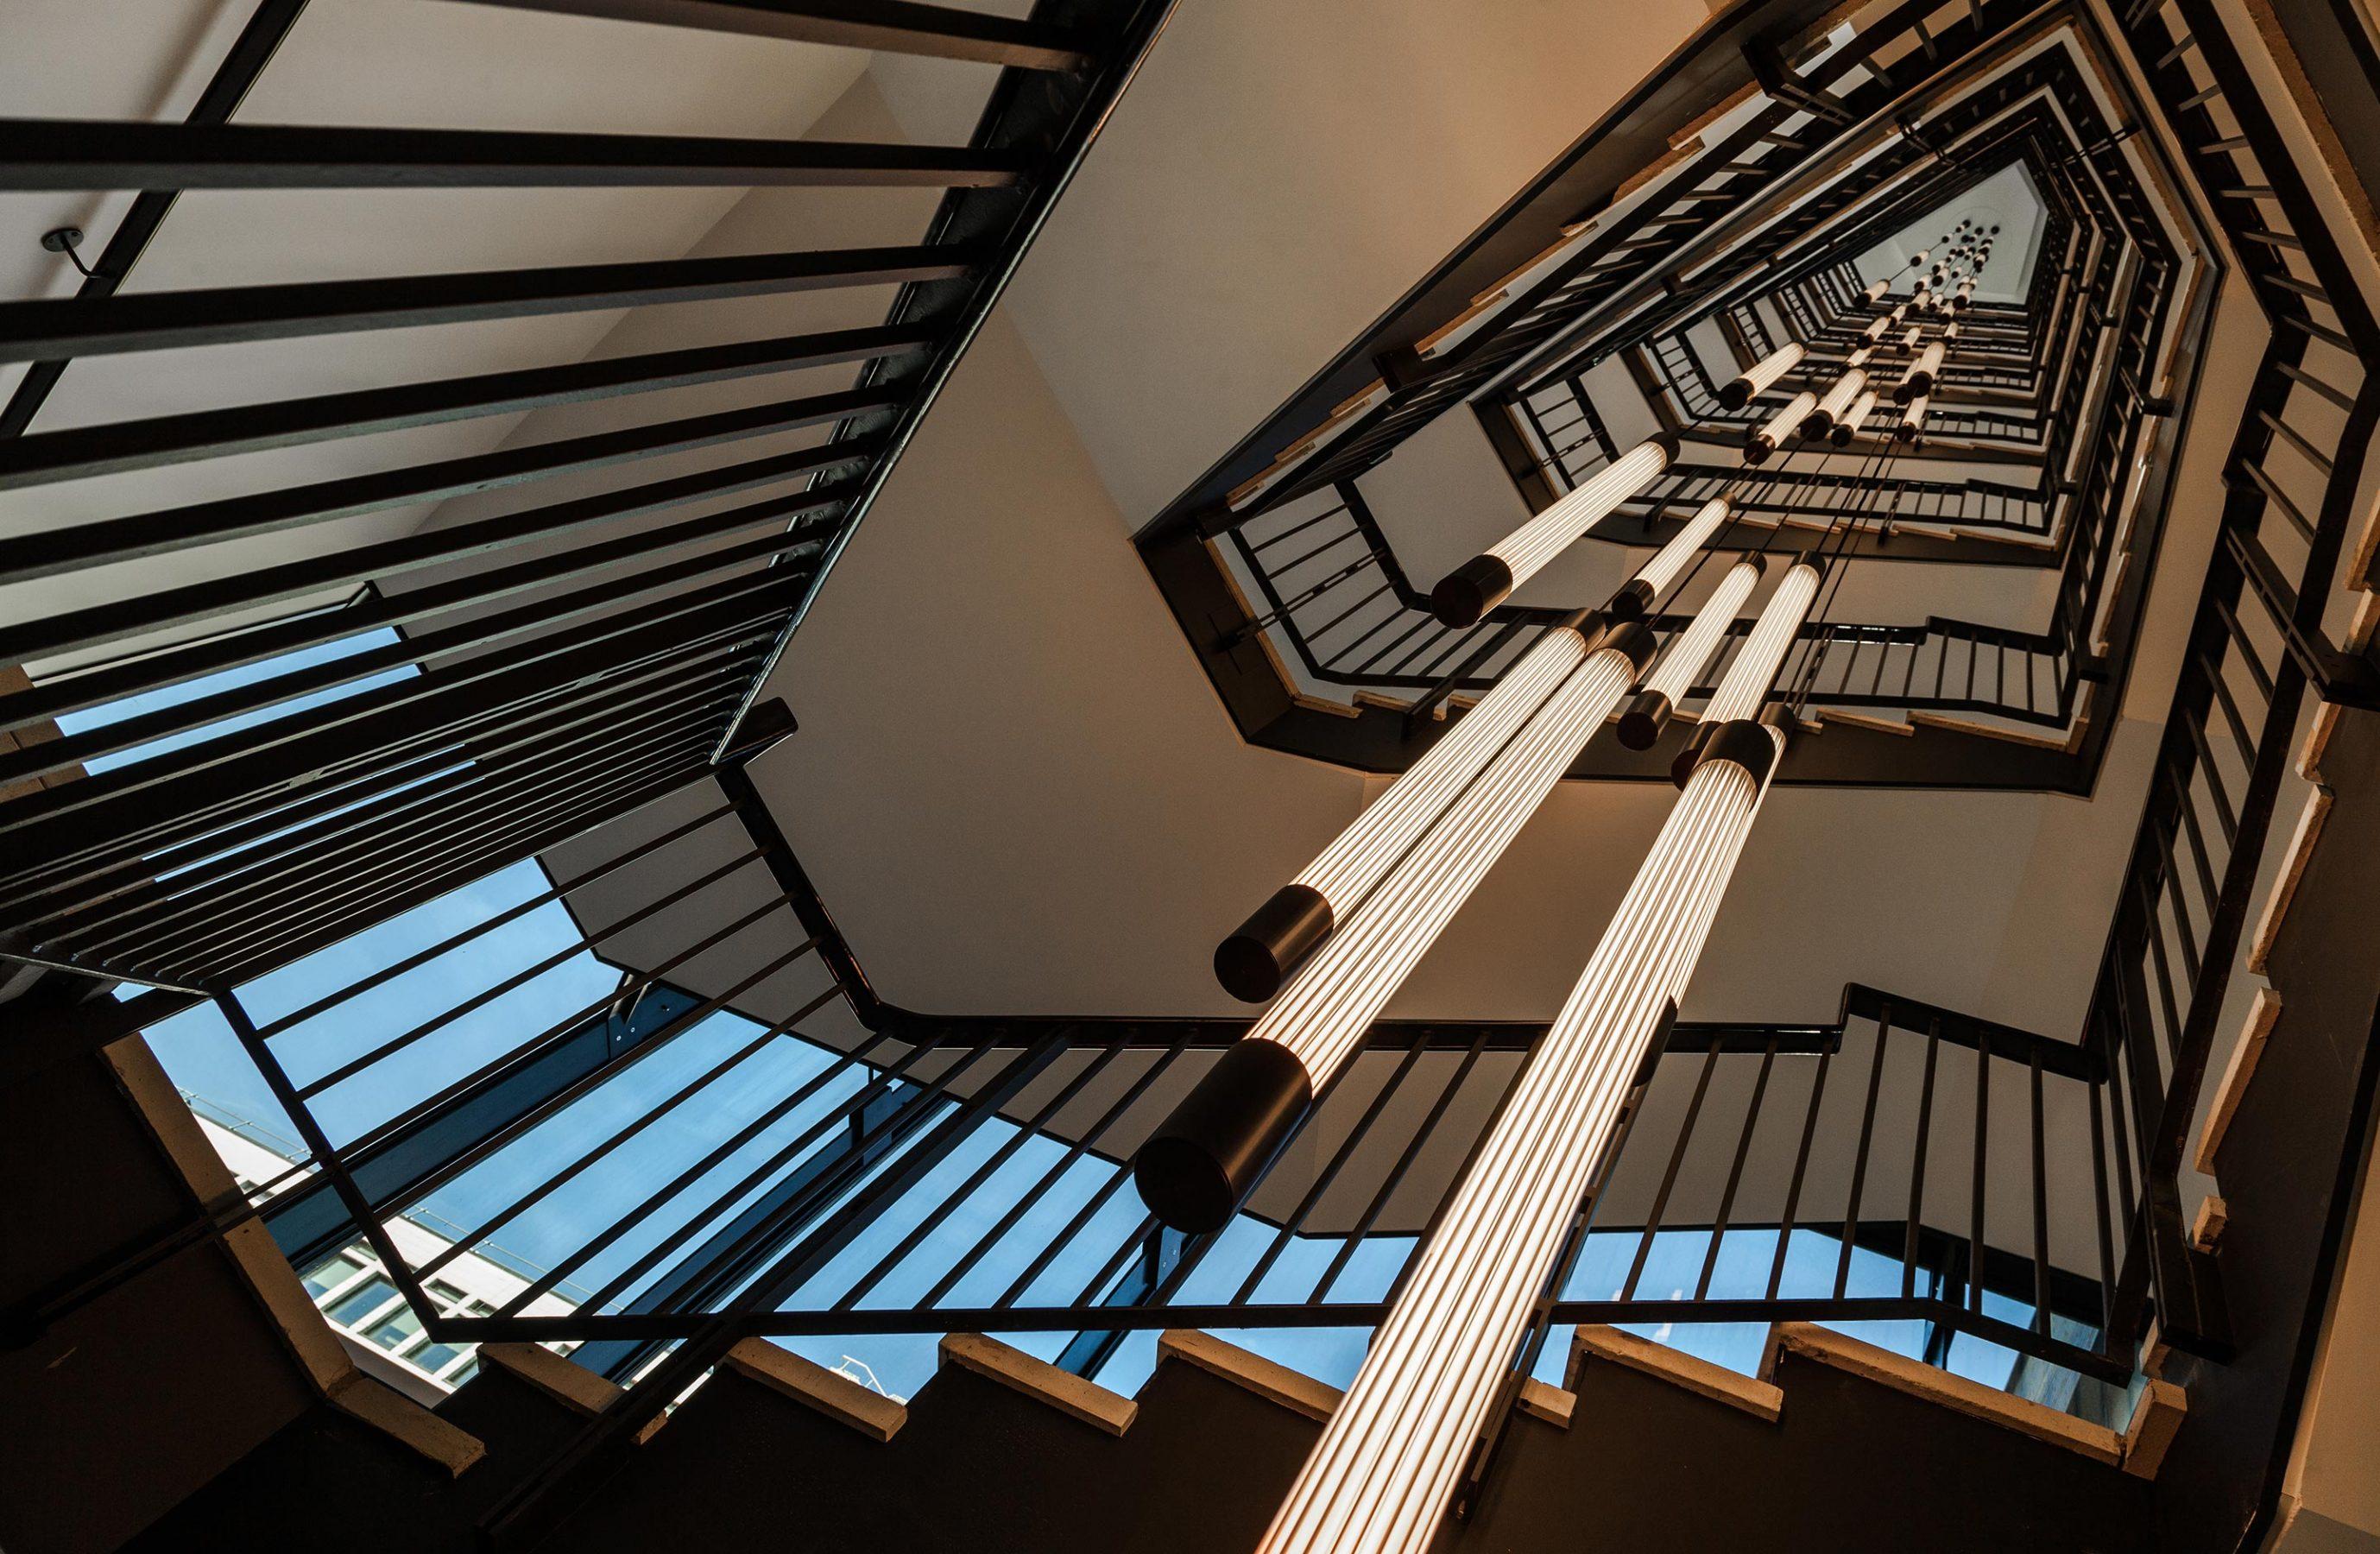 07-Bauhaus-haberdashery-w-slideshow